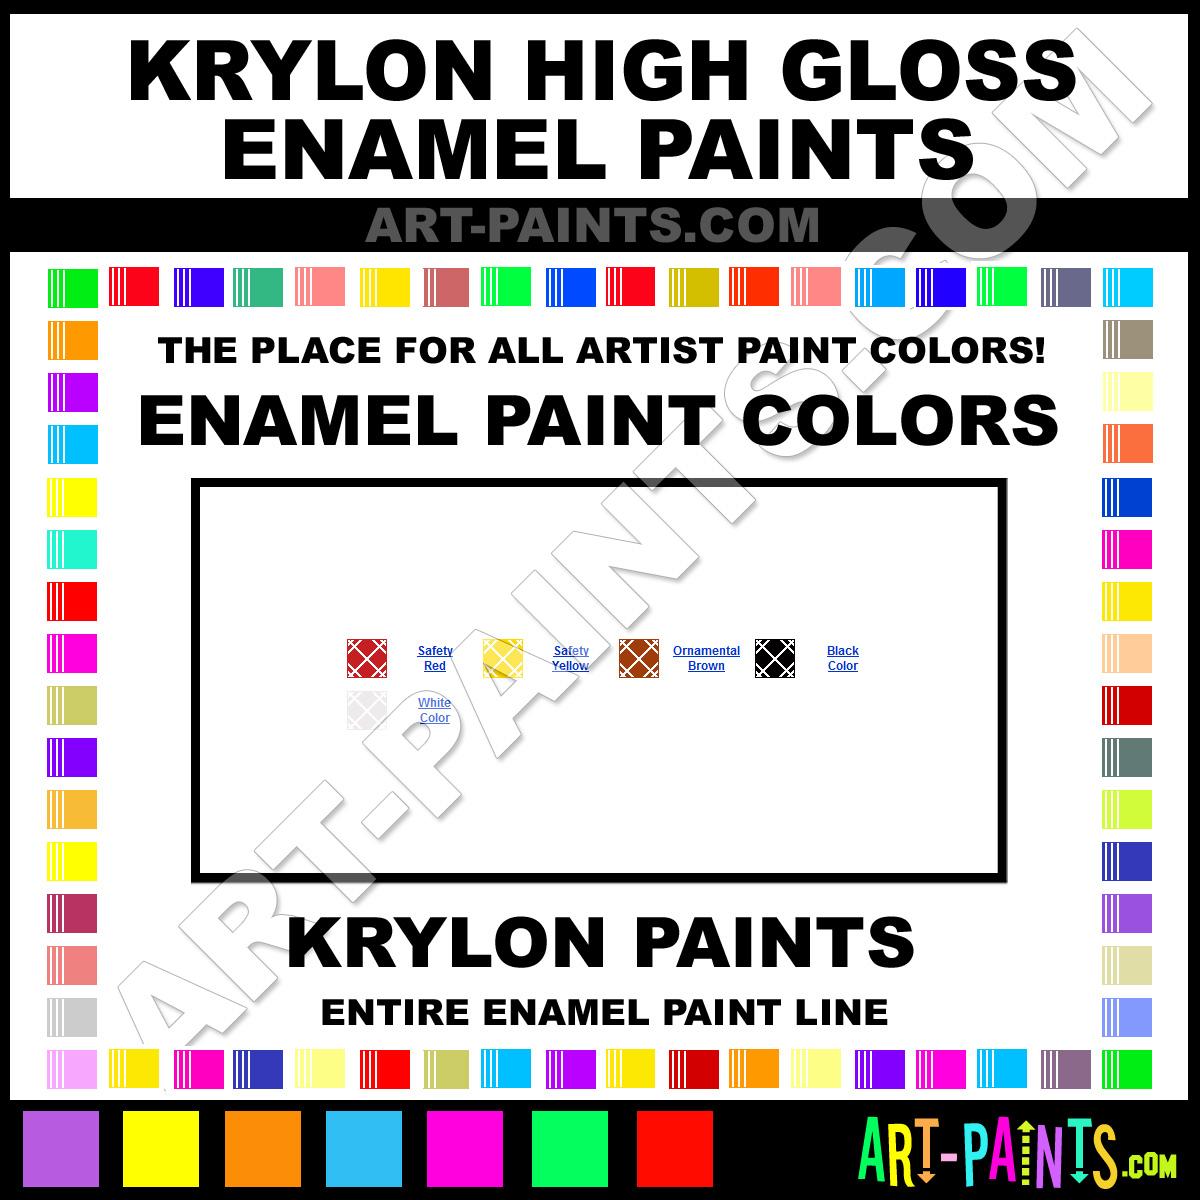 Krylon high gloss enamel paint colors krylon high gloss paint krylon high gloss enamels krylon high gloss paints geenschuldenfo Images